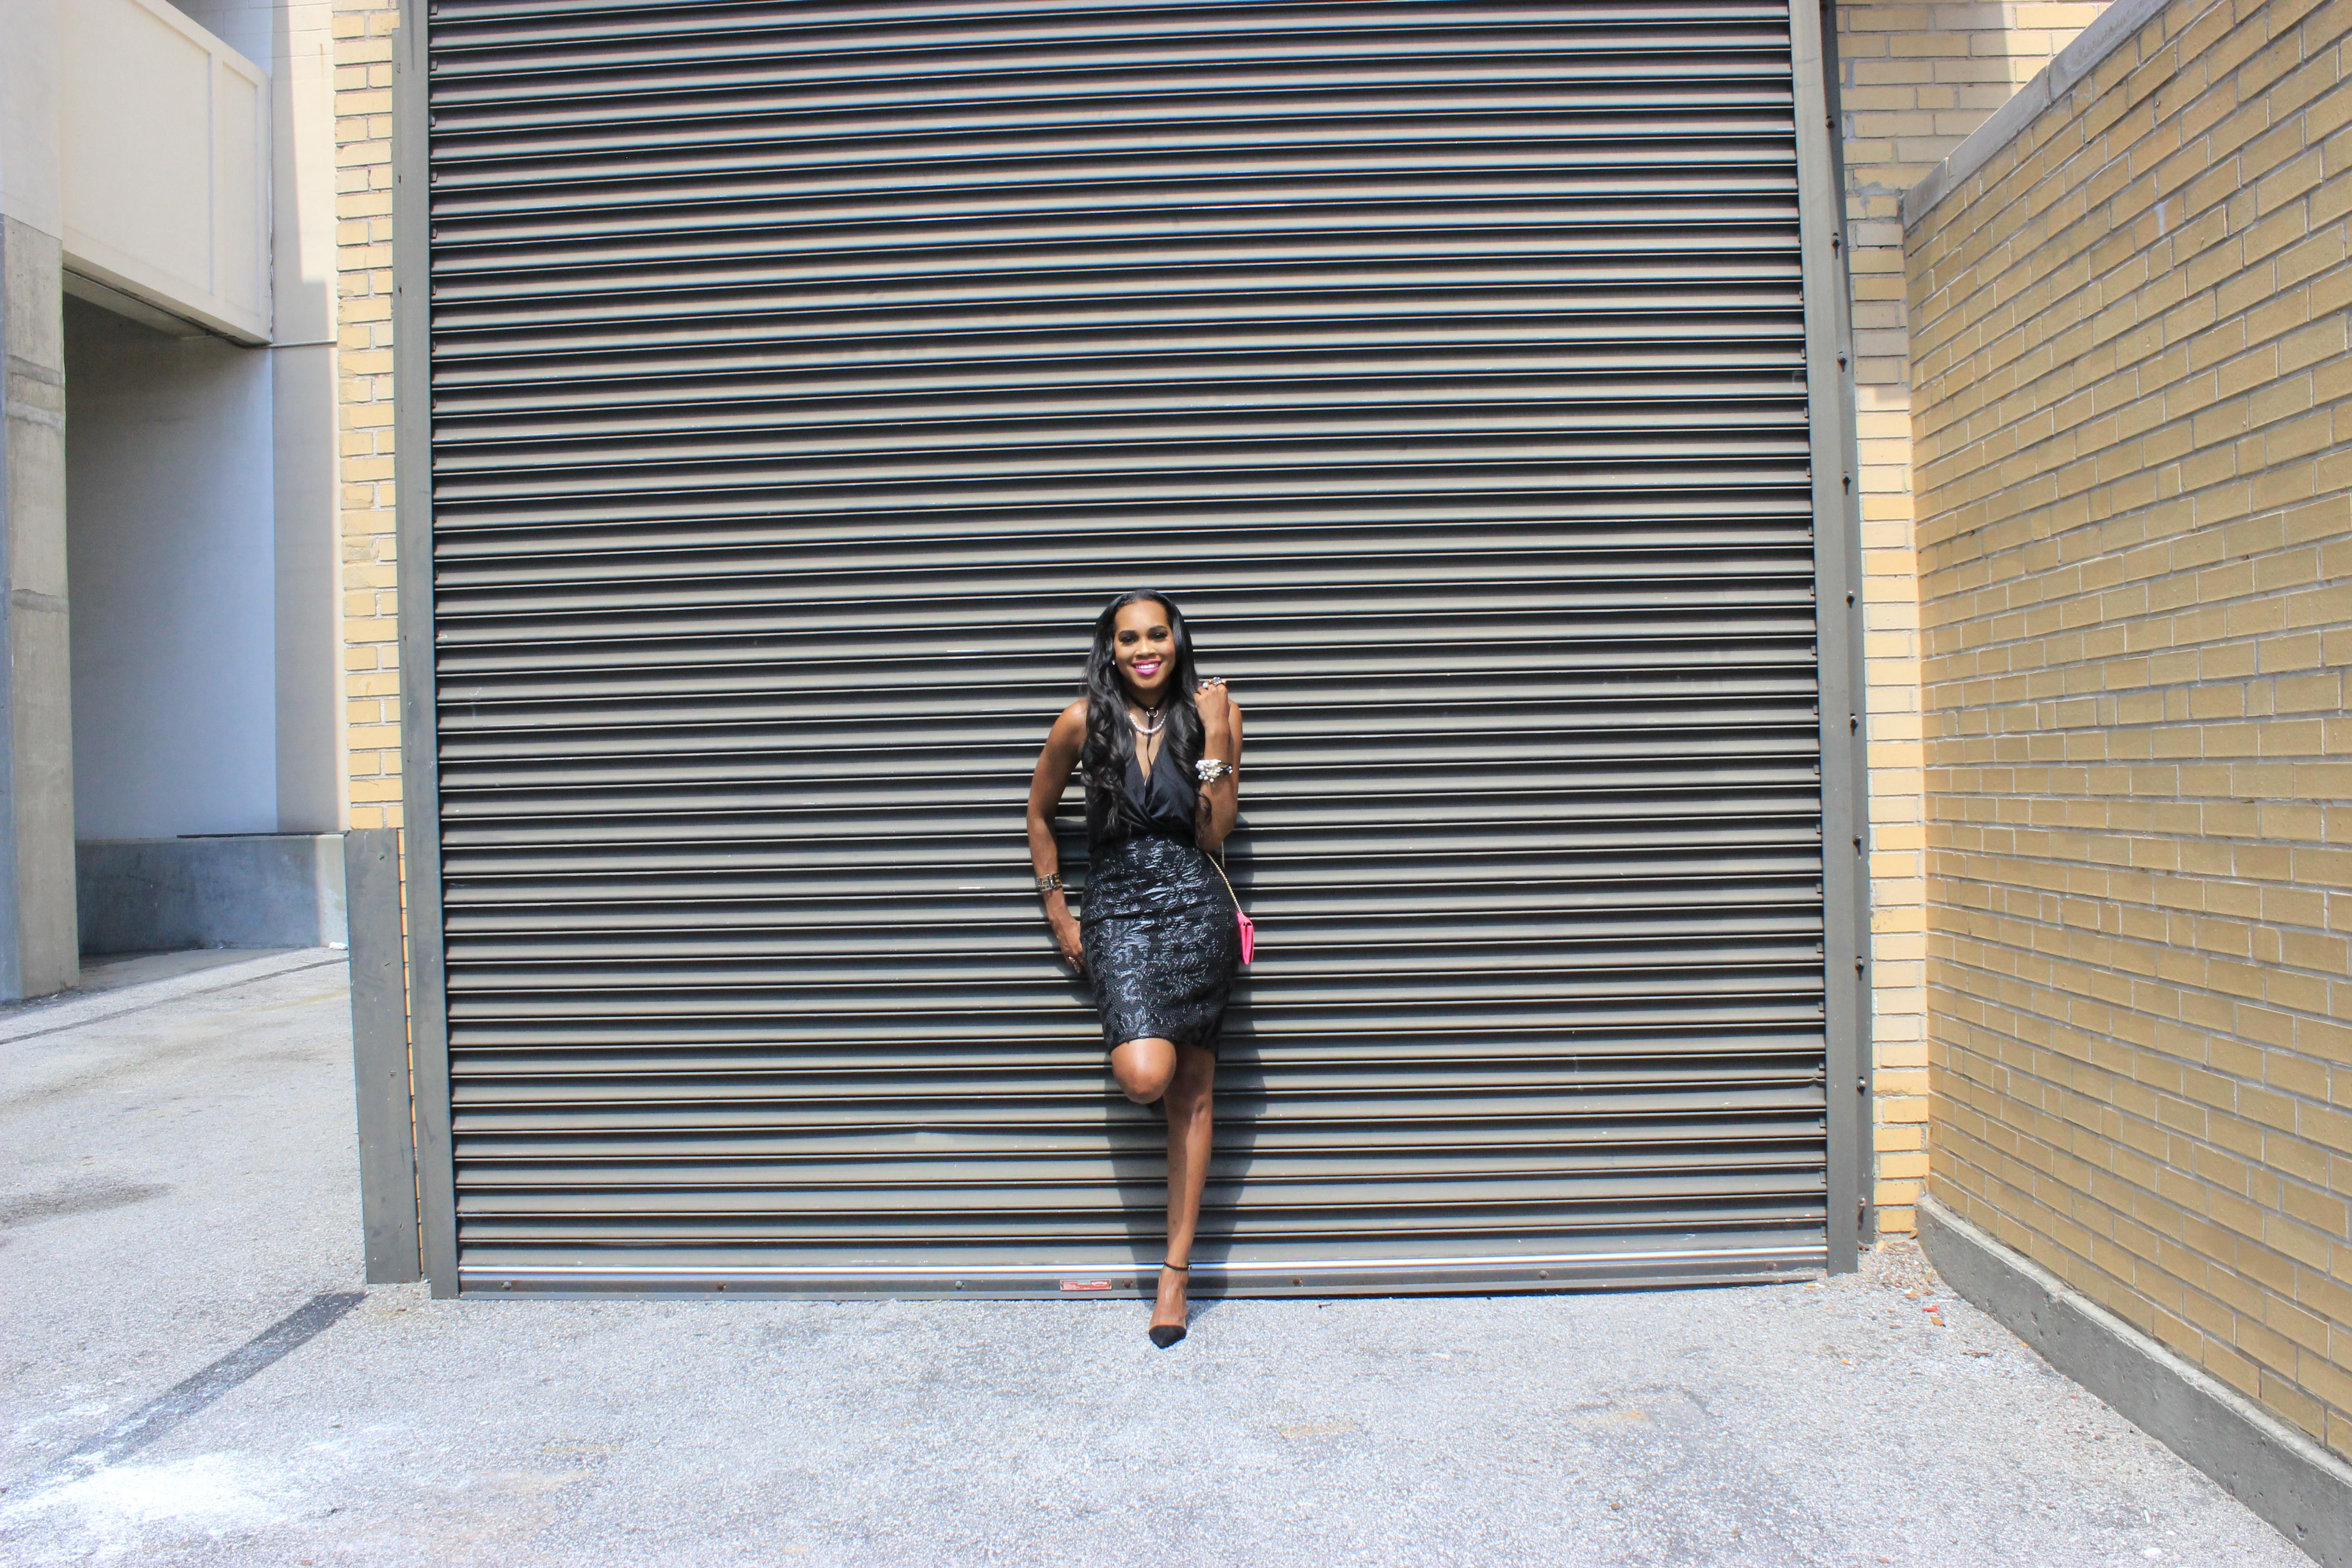 Style-Files-Forever-21-black-lace-pencil-skirt-victoria-secret-black-vneck-bodysuit-all-black-fashion-look-Zara-vinyl-d-orsay-pumps-oohlalablog-31